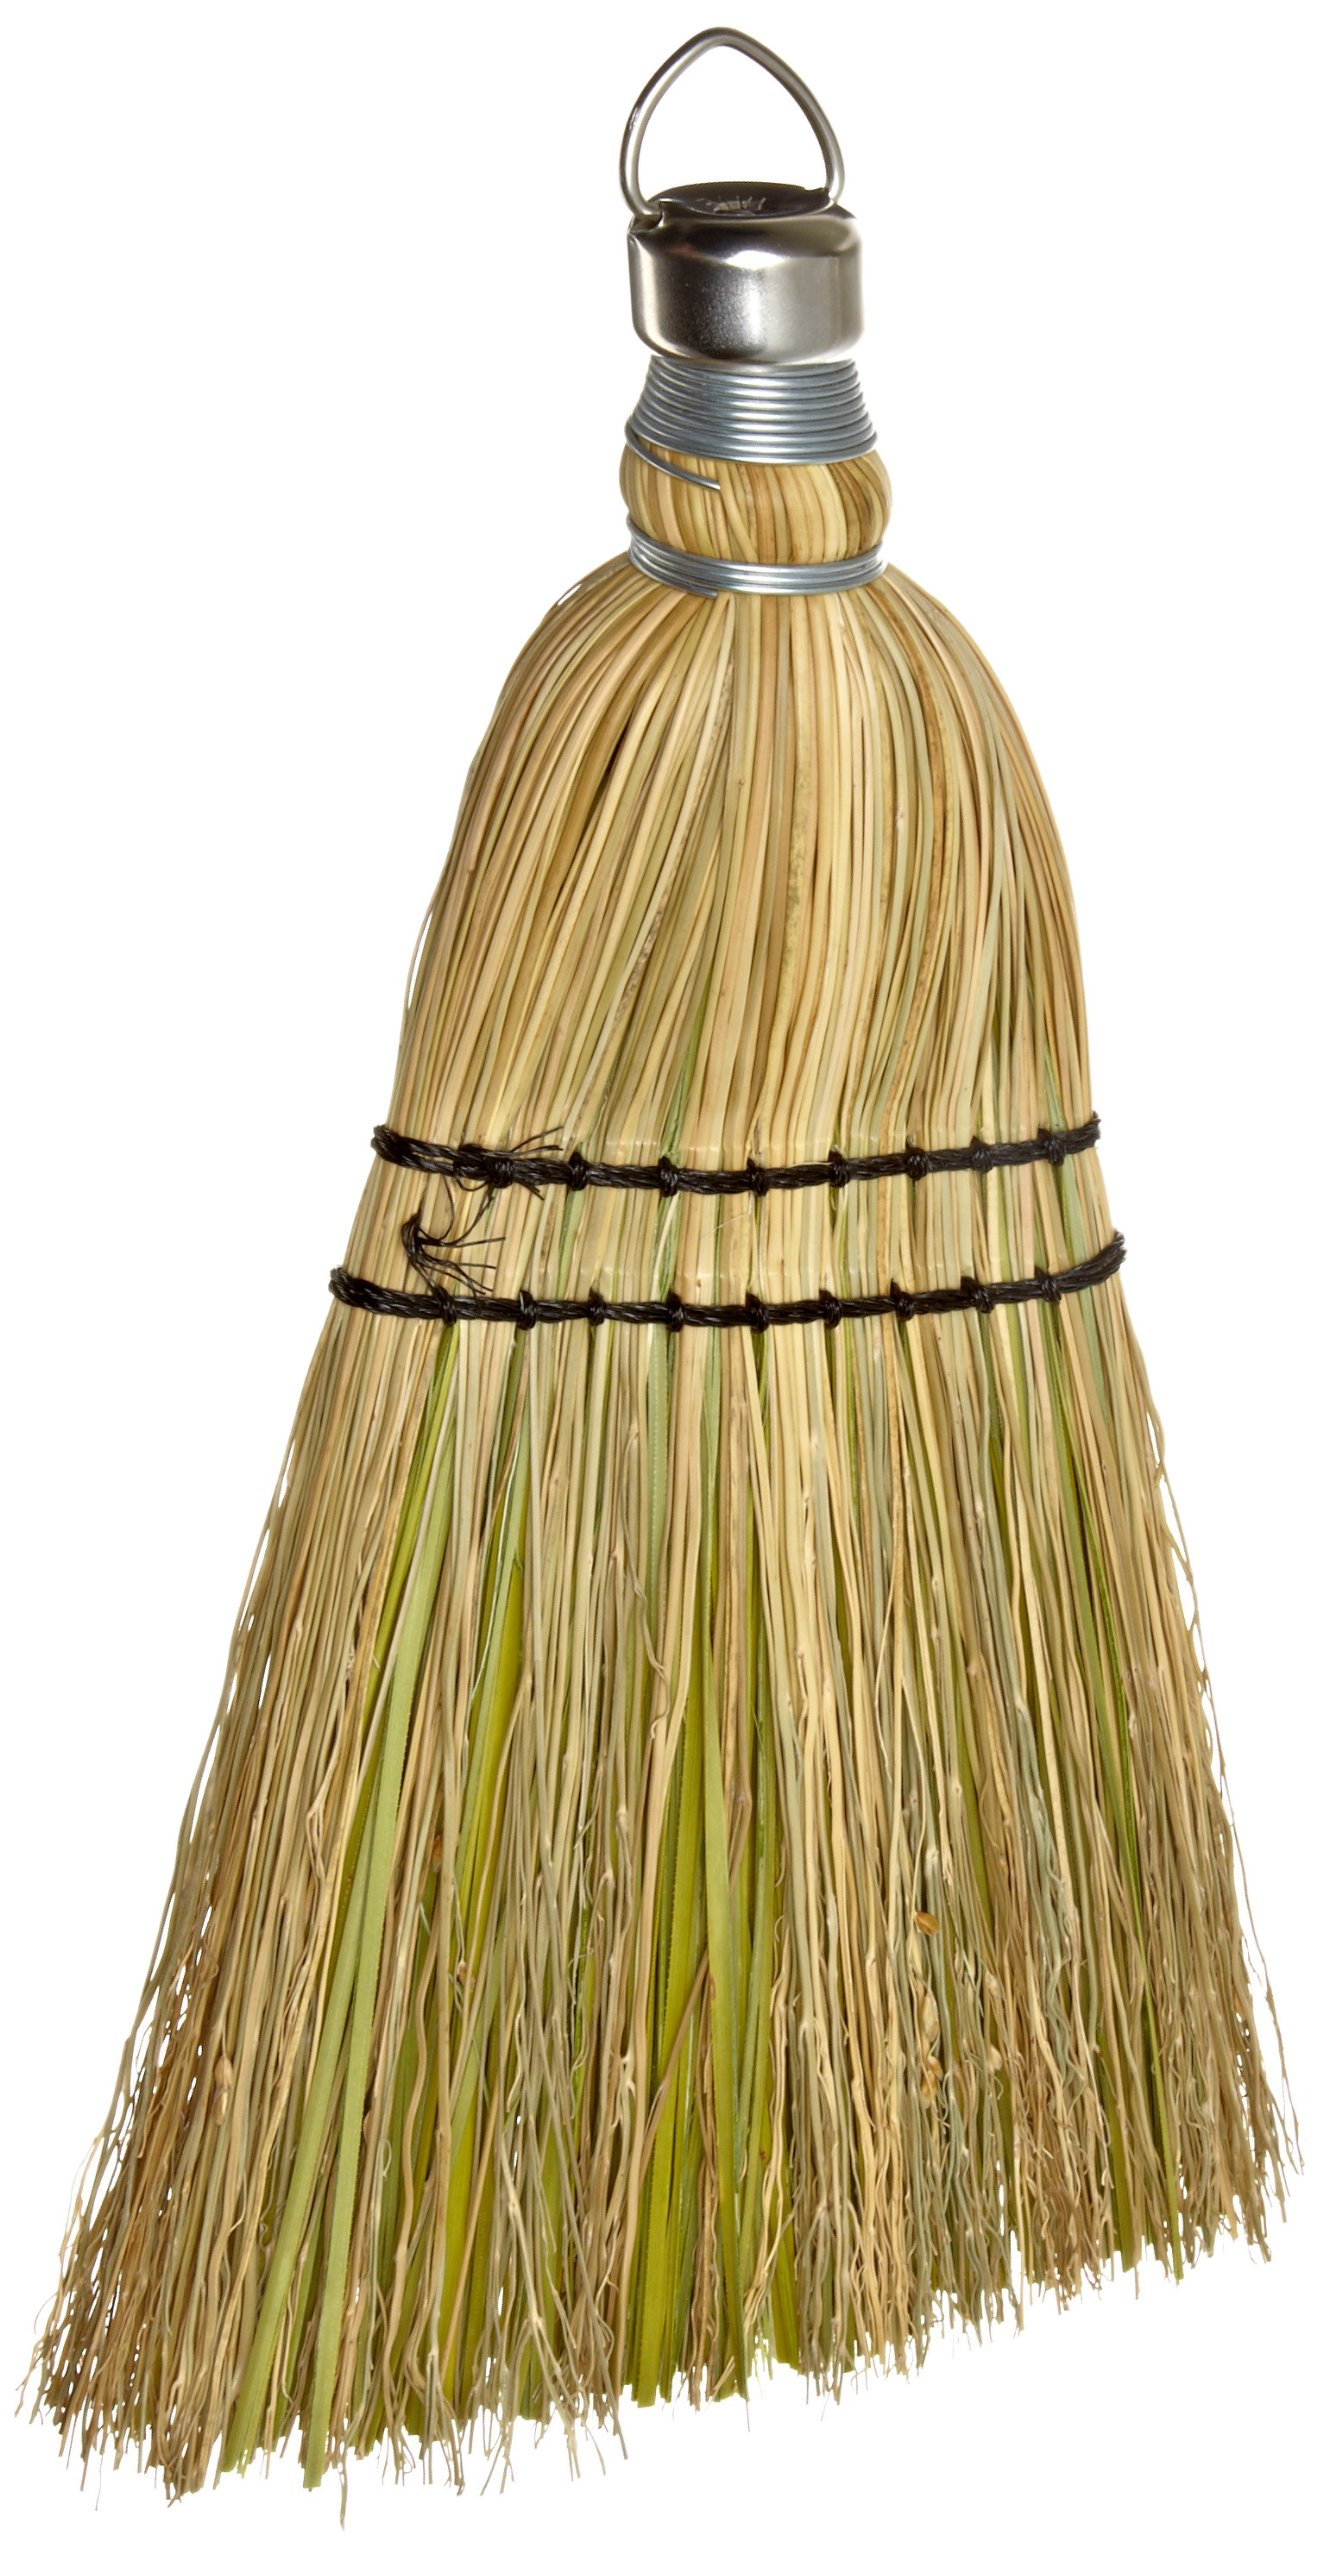 Rubbermaid Commercial Corn Fiber Whisk Brush, 12-Inch, Yellow, FG9B5500YEL